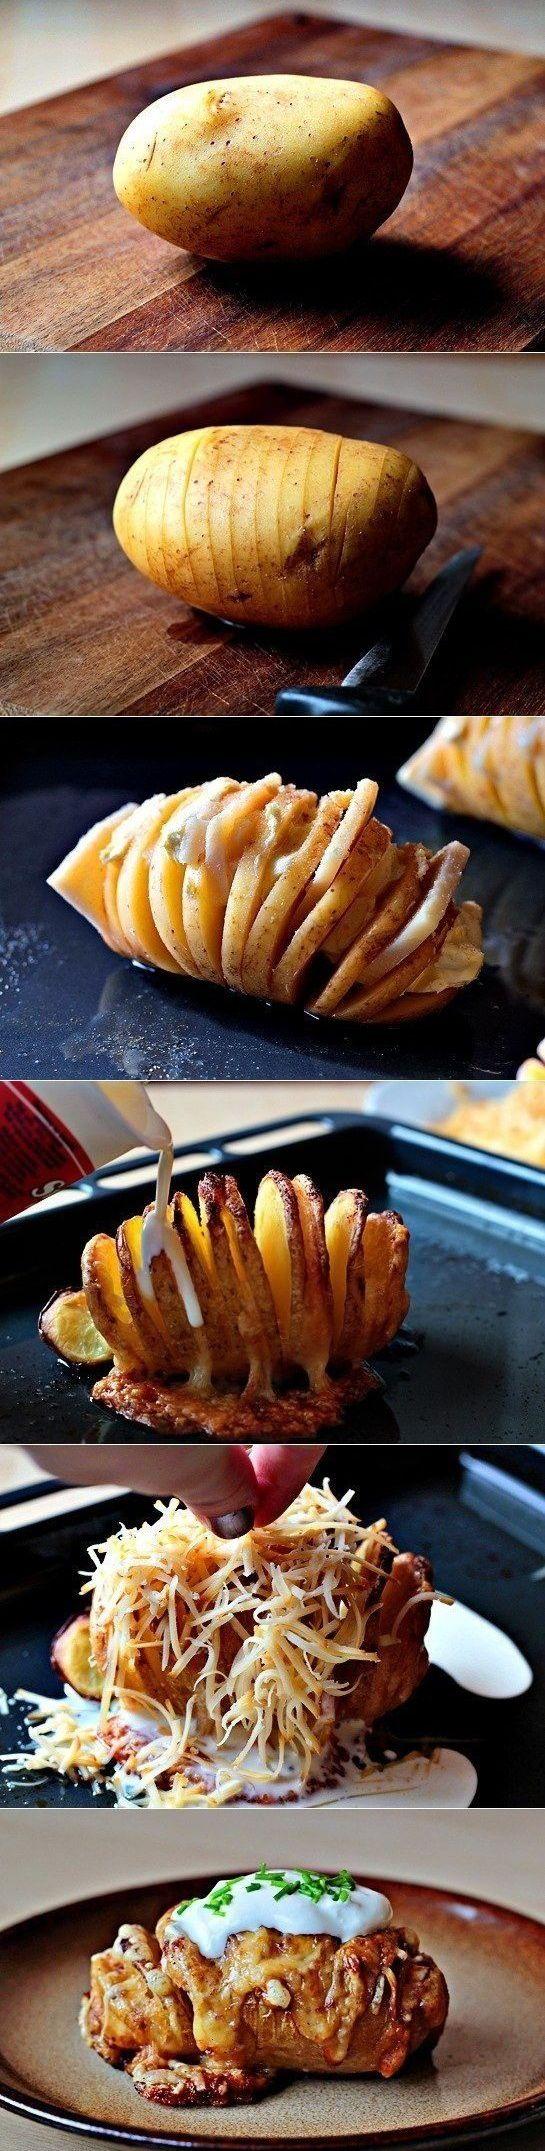 Tasty Way To Bake A Potato